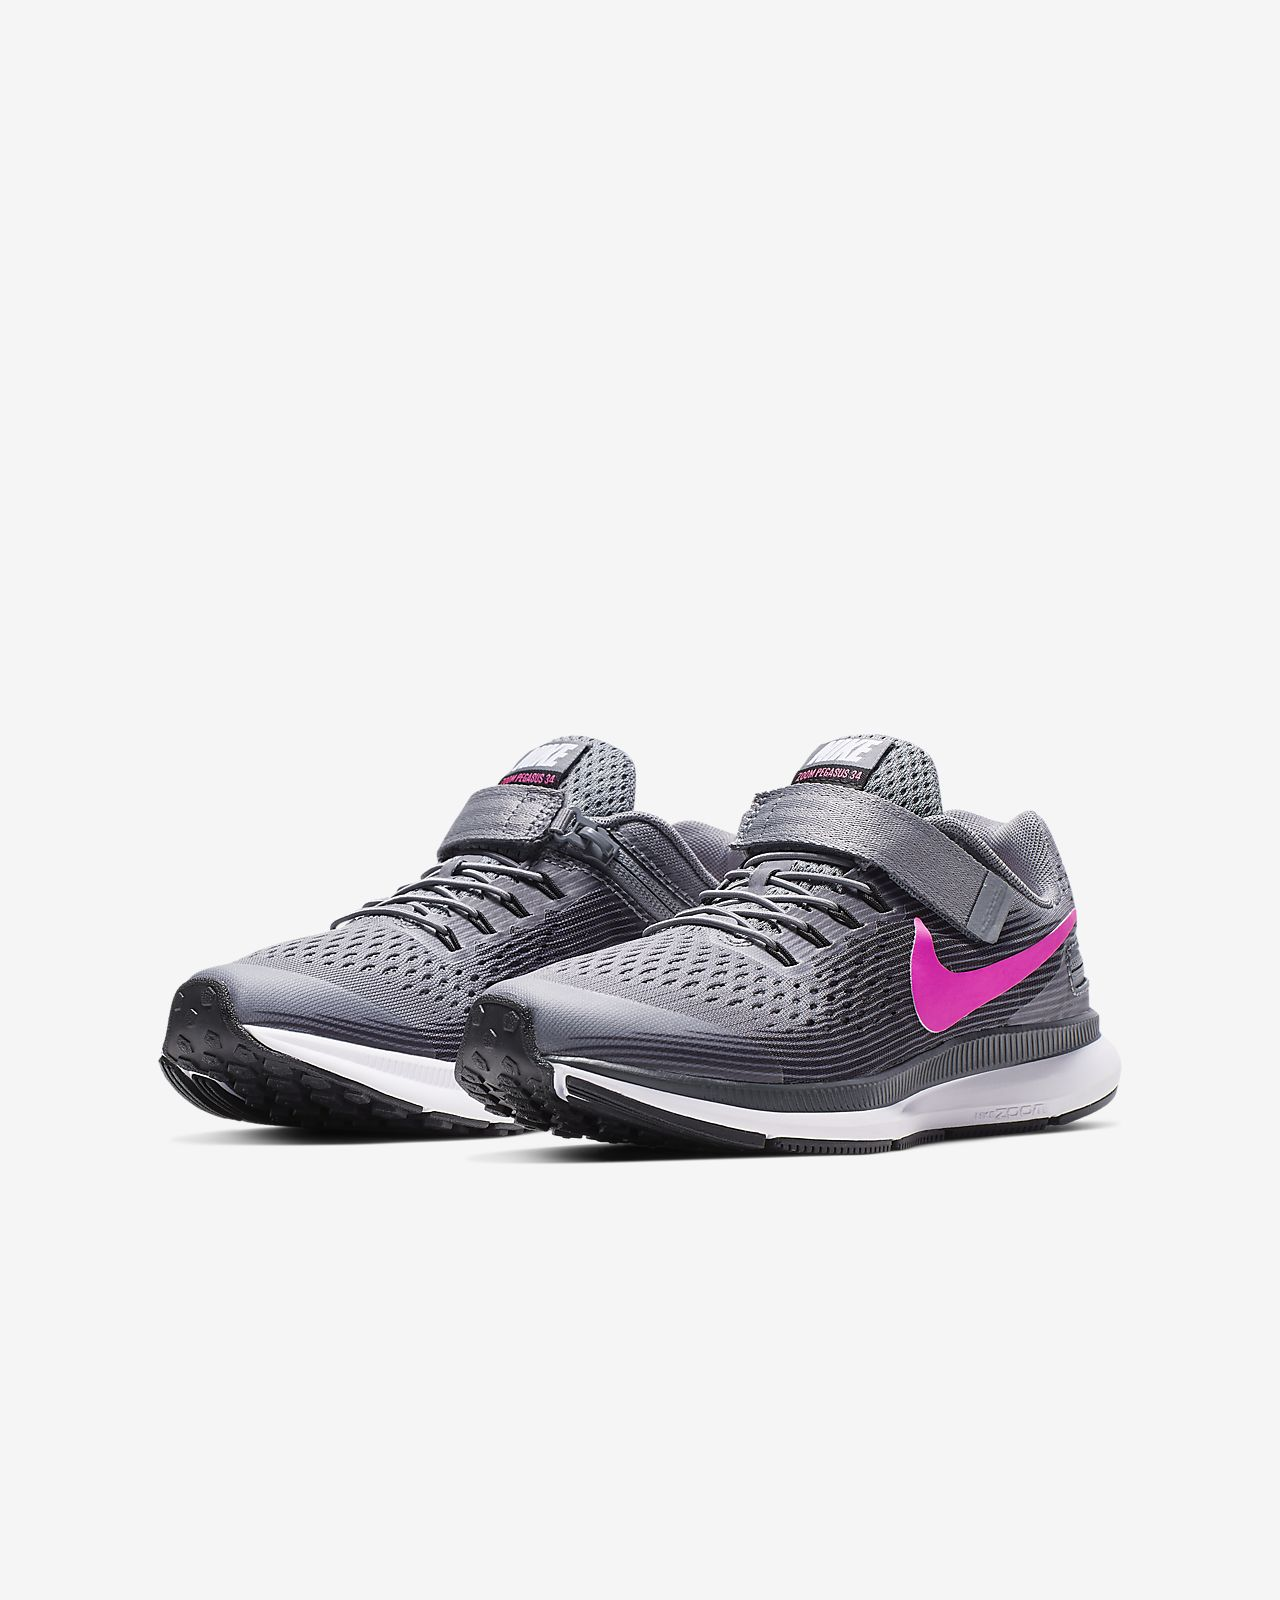 7ae60336d2de Nike Zoom Pegasus 34 FlyEase Little Big Kids  Running Shoe. Nike.com